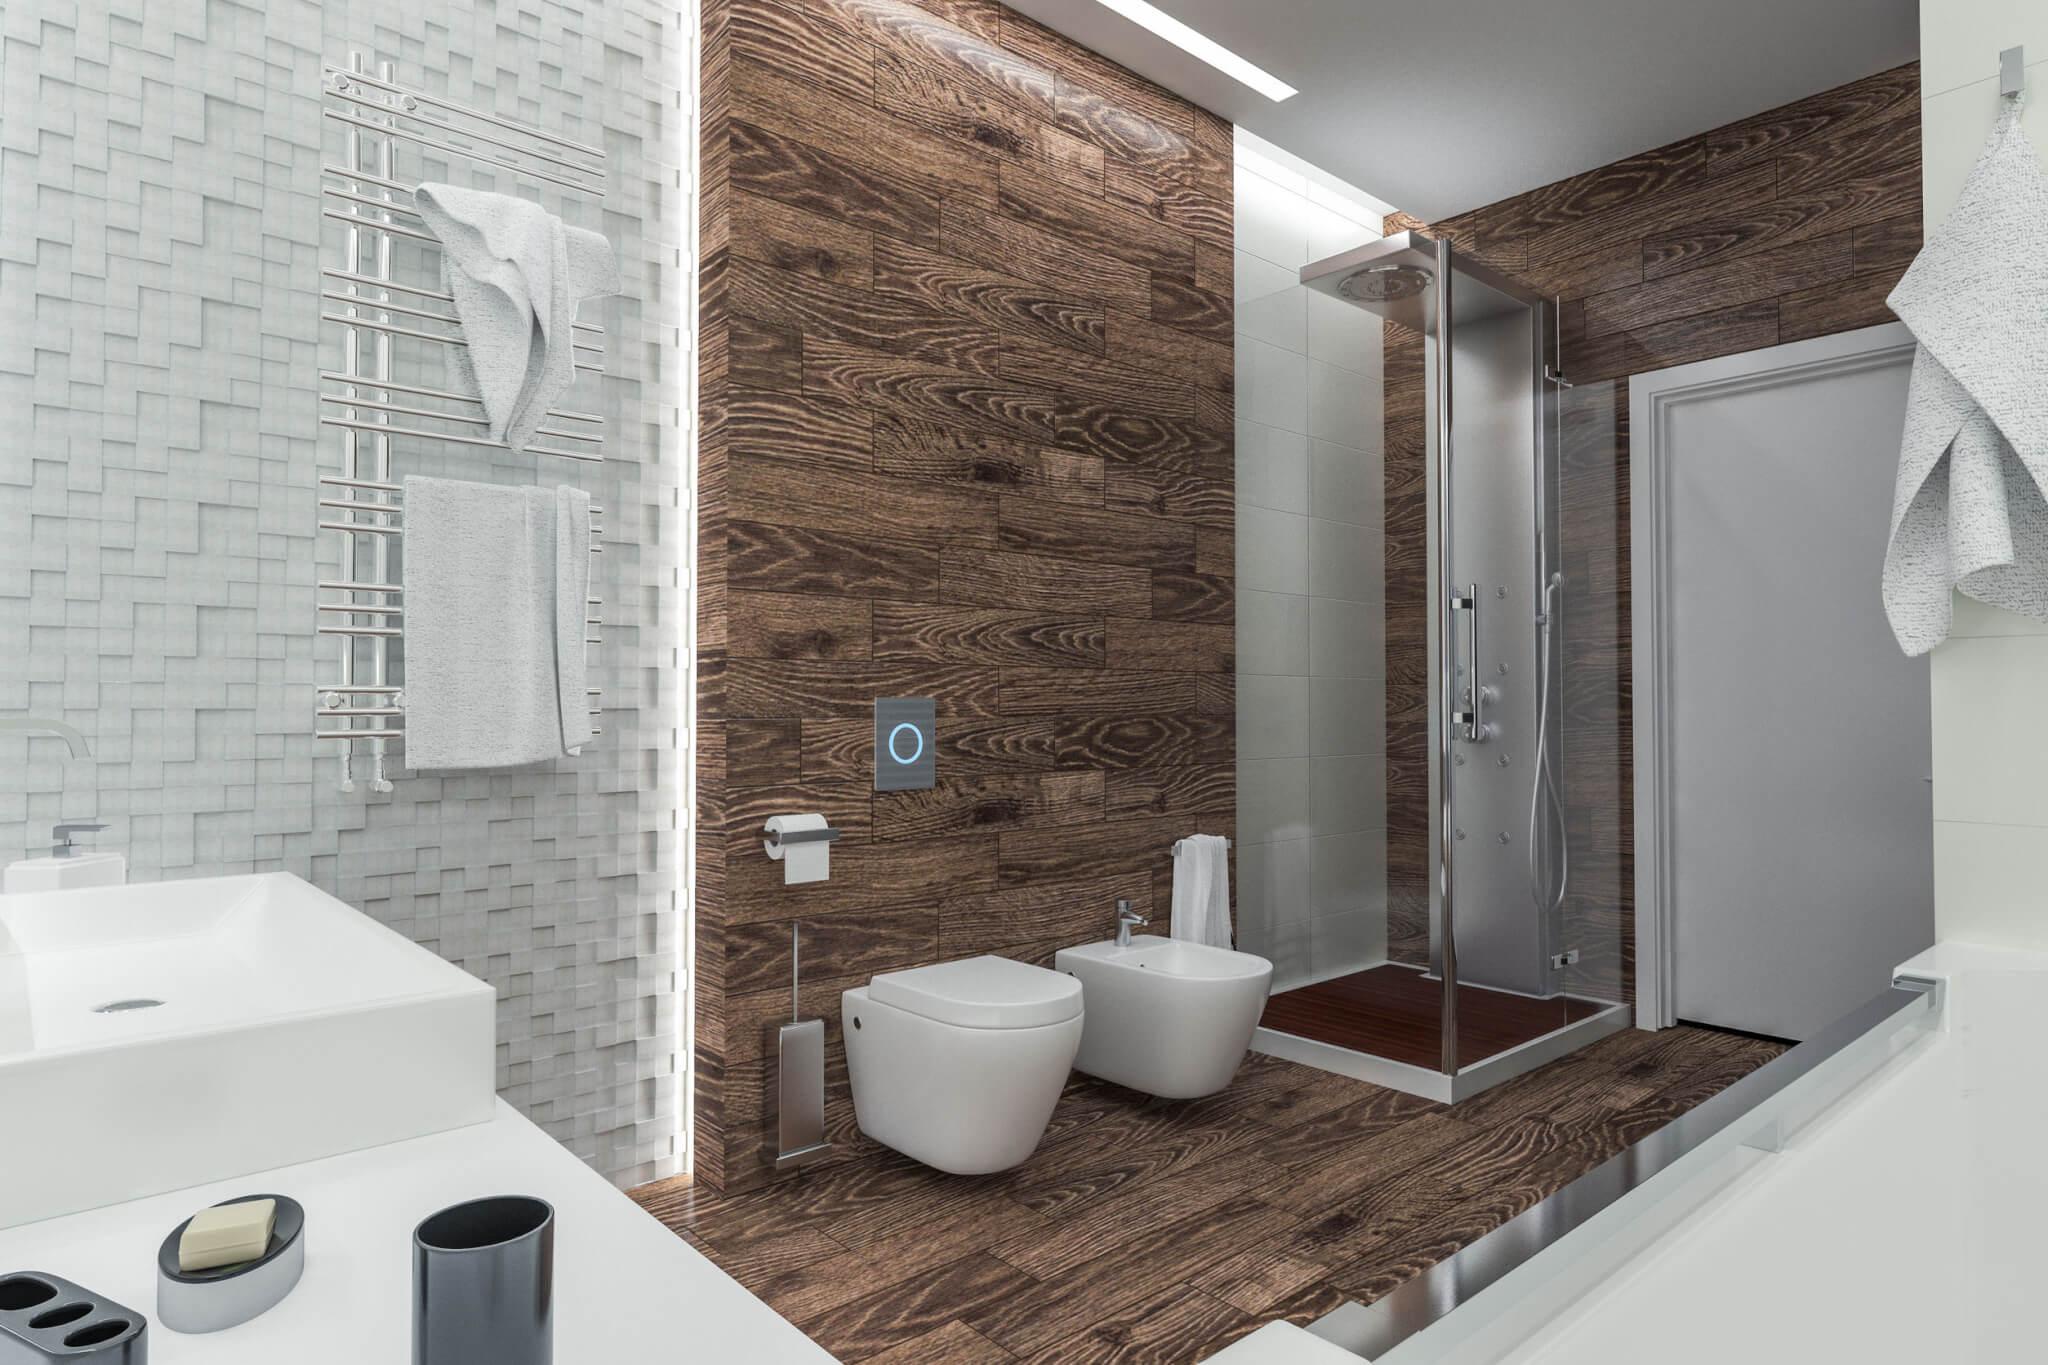 43578209 - modern design of a bathroom with shower